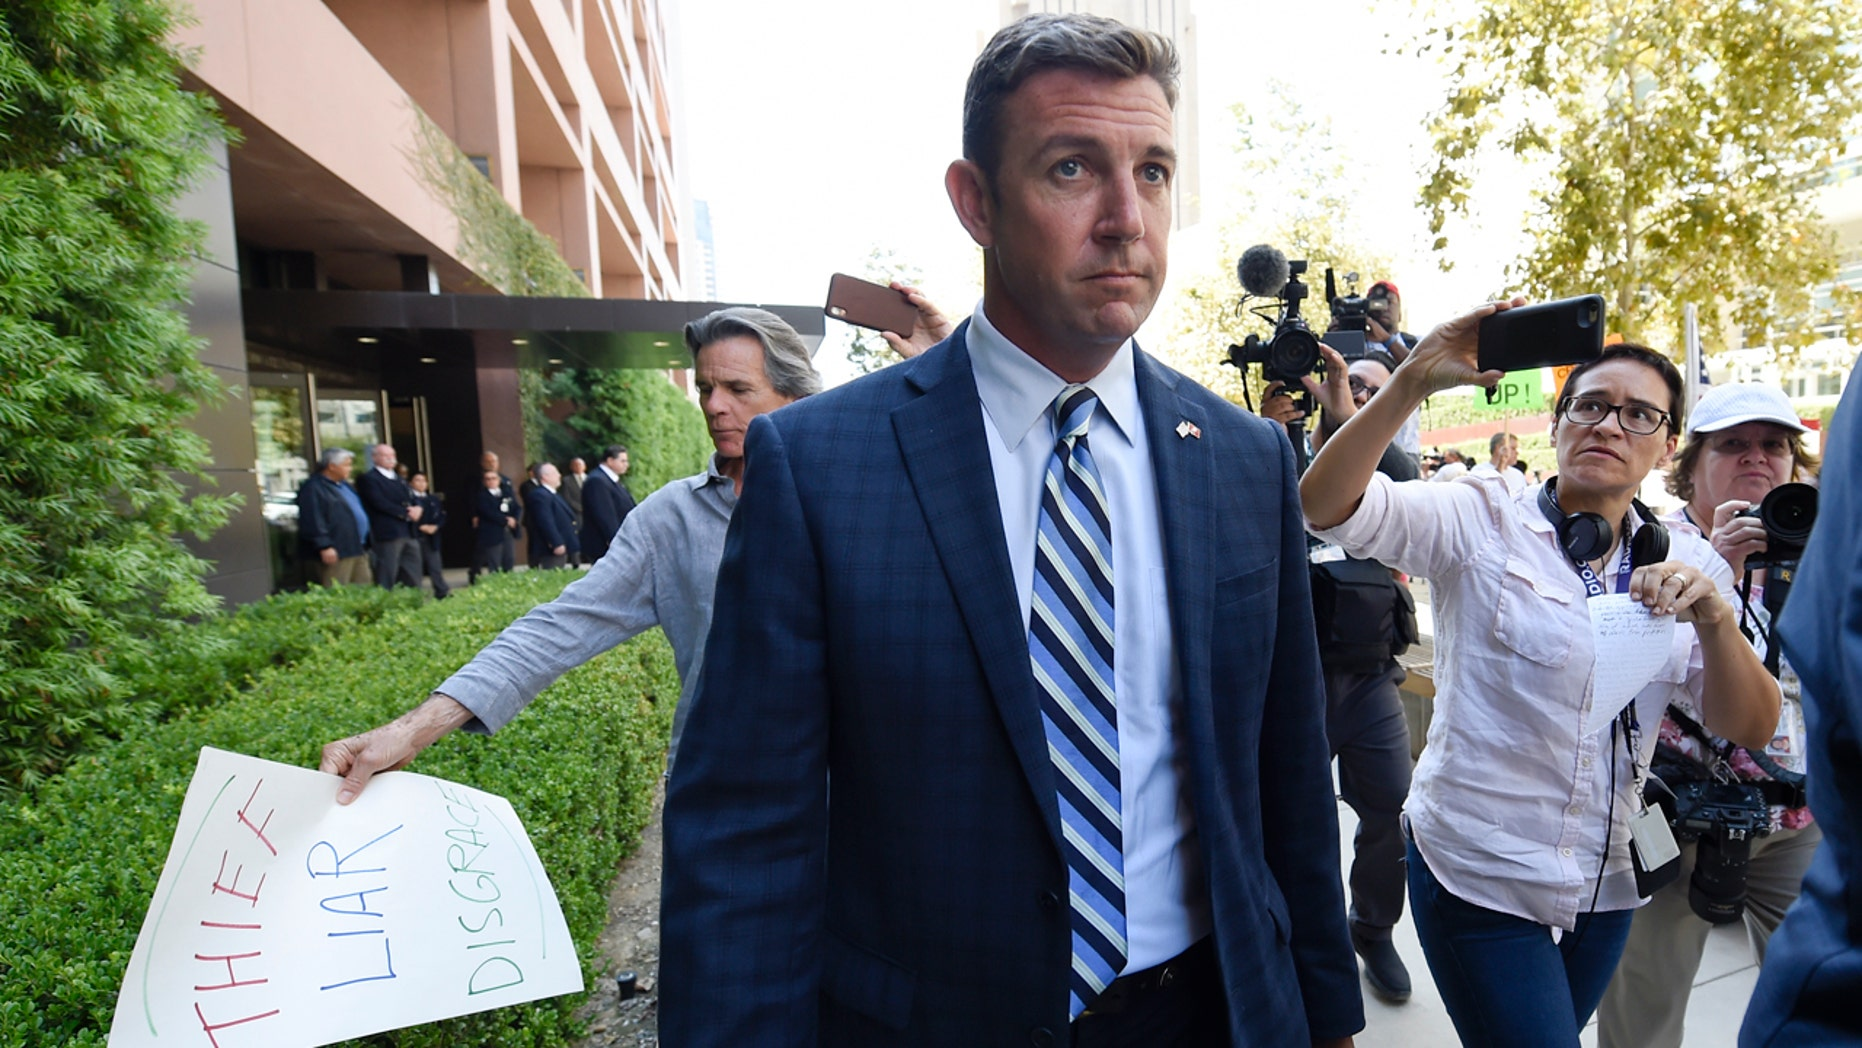 U.S. Rep. Duncan Hunter leaves an arraignment hearing in San Diego, Aug. 23, 2018.